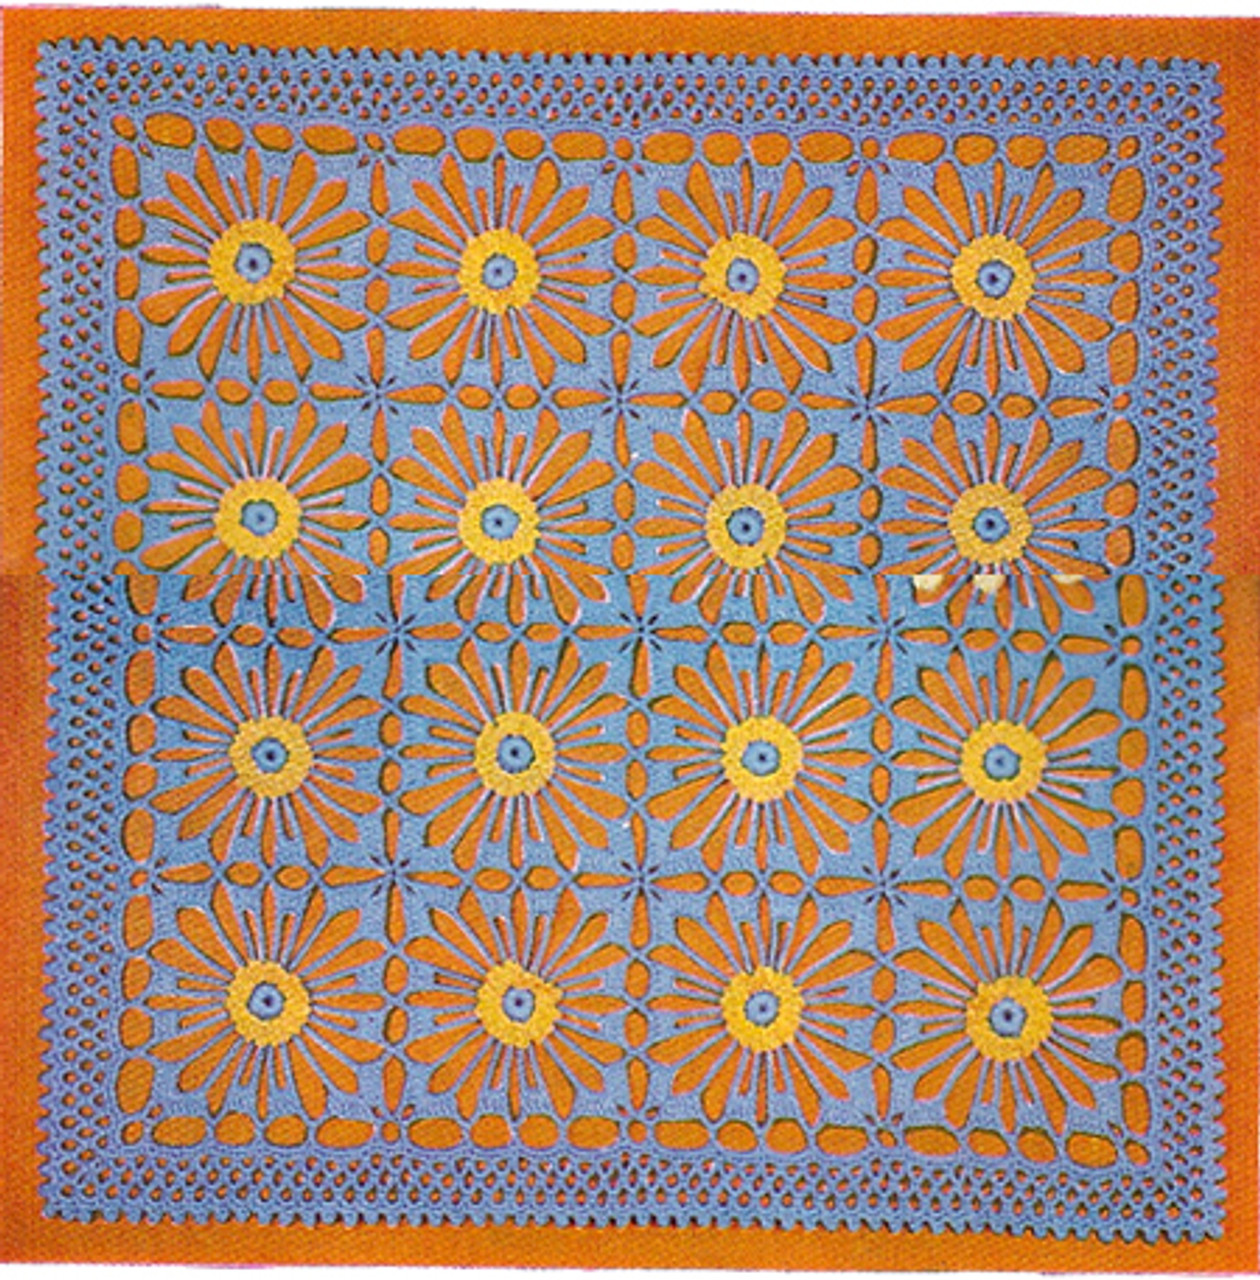 Vintage Flower Medallion Square Doily Pattern